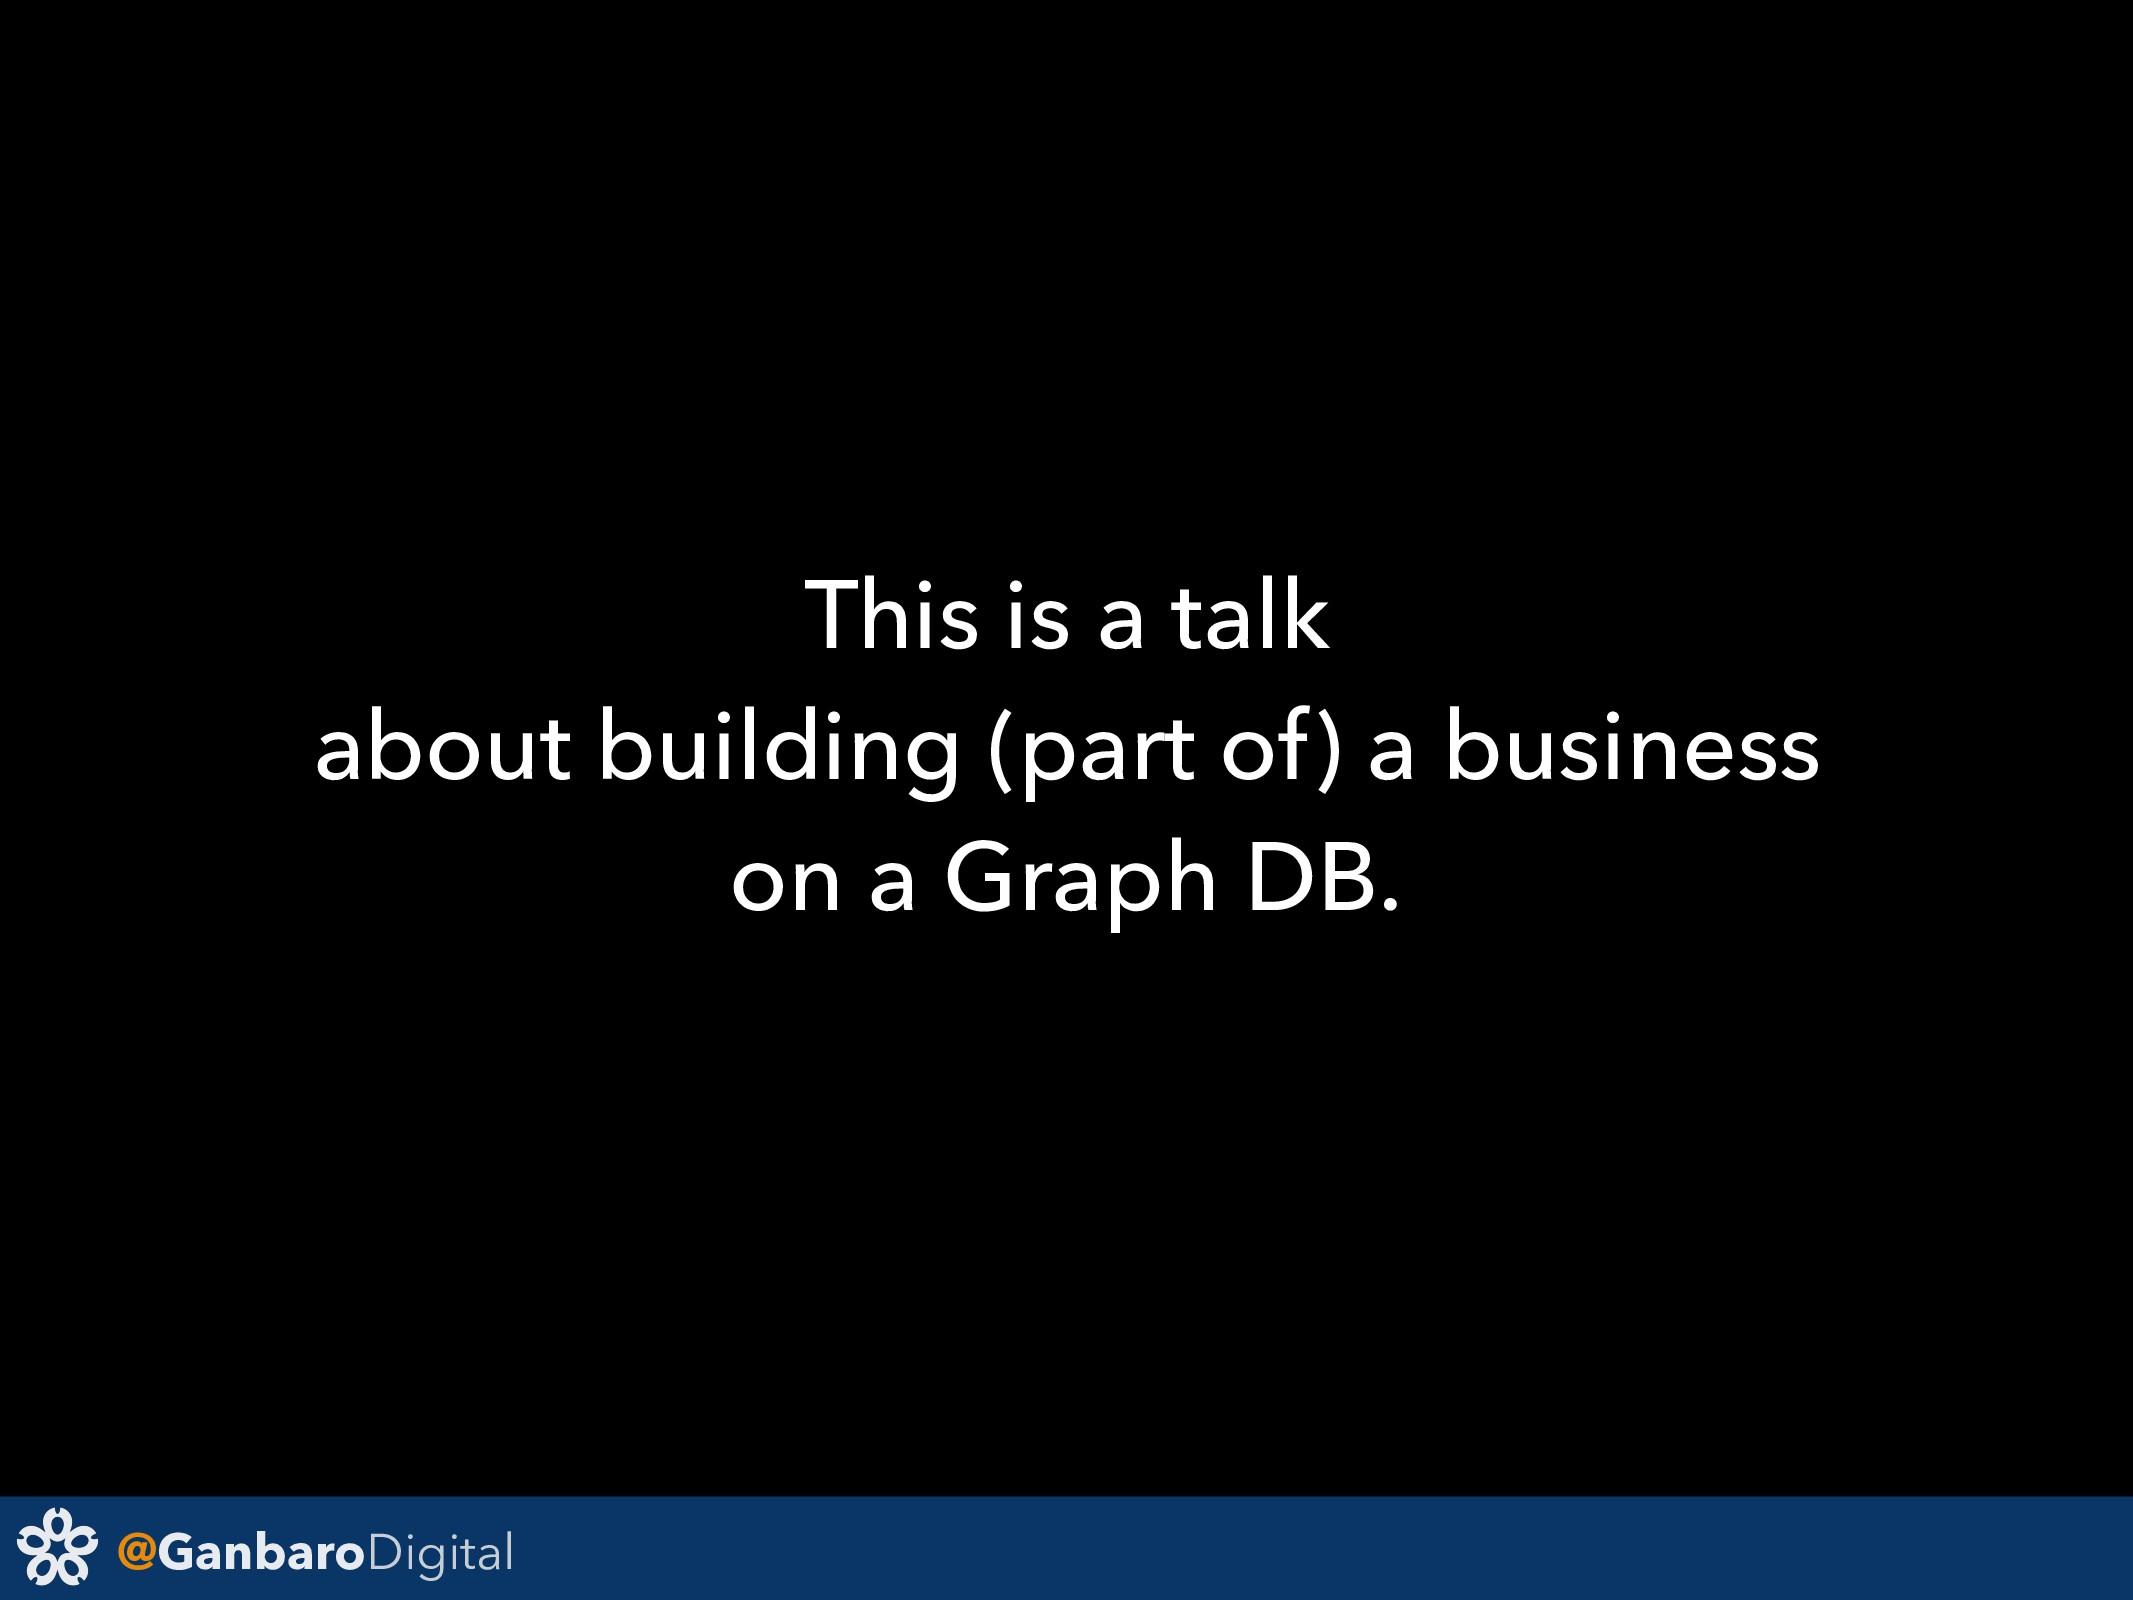 @GanbaroDigital This is a talk about building (...